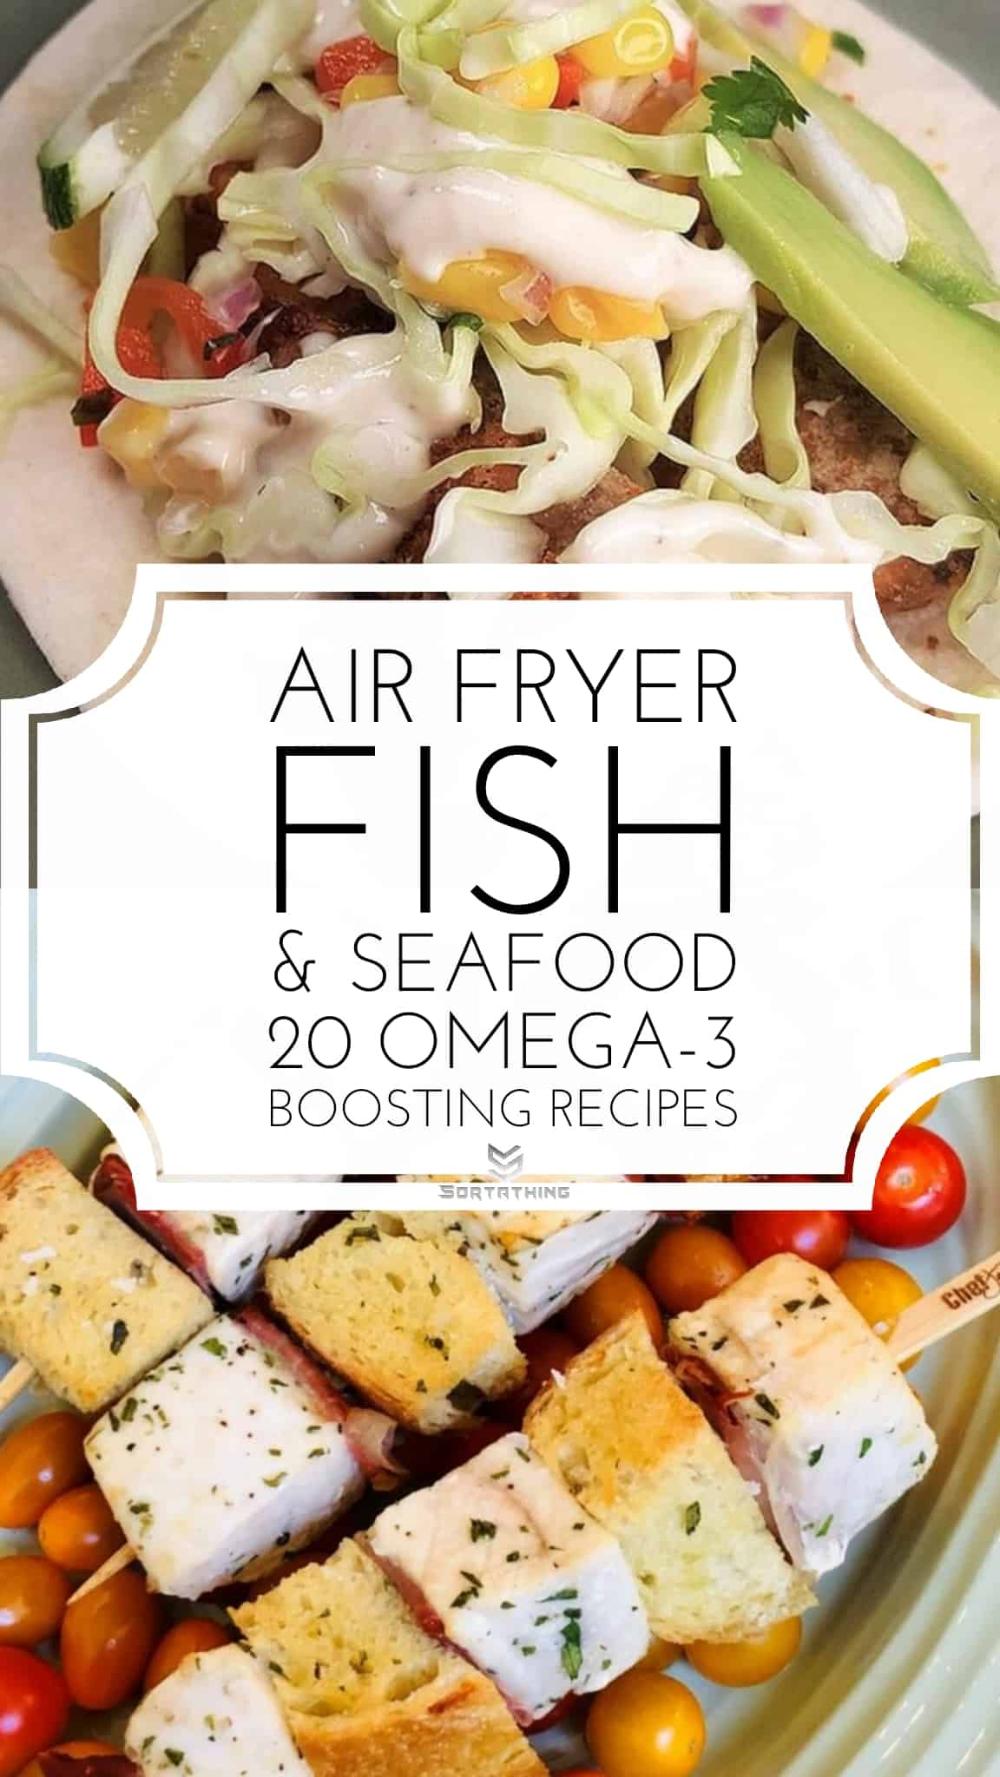 Air Fryer Fish Recipes 20 Omega3 Boosting Seafood